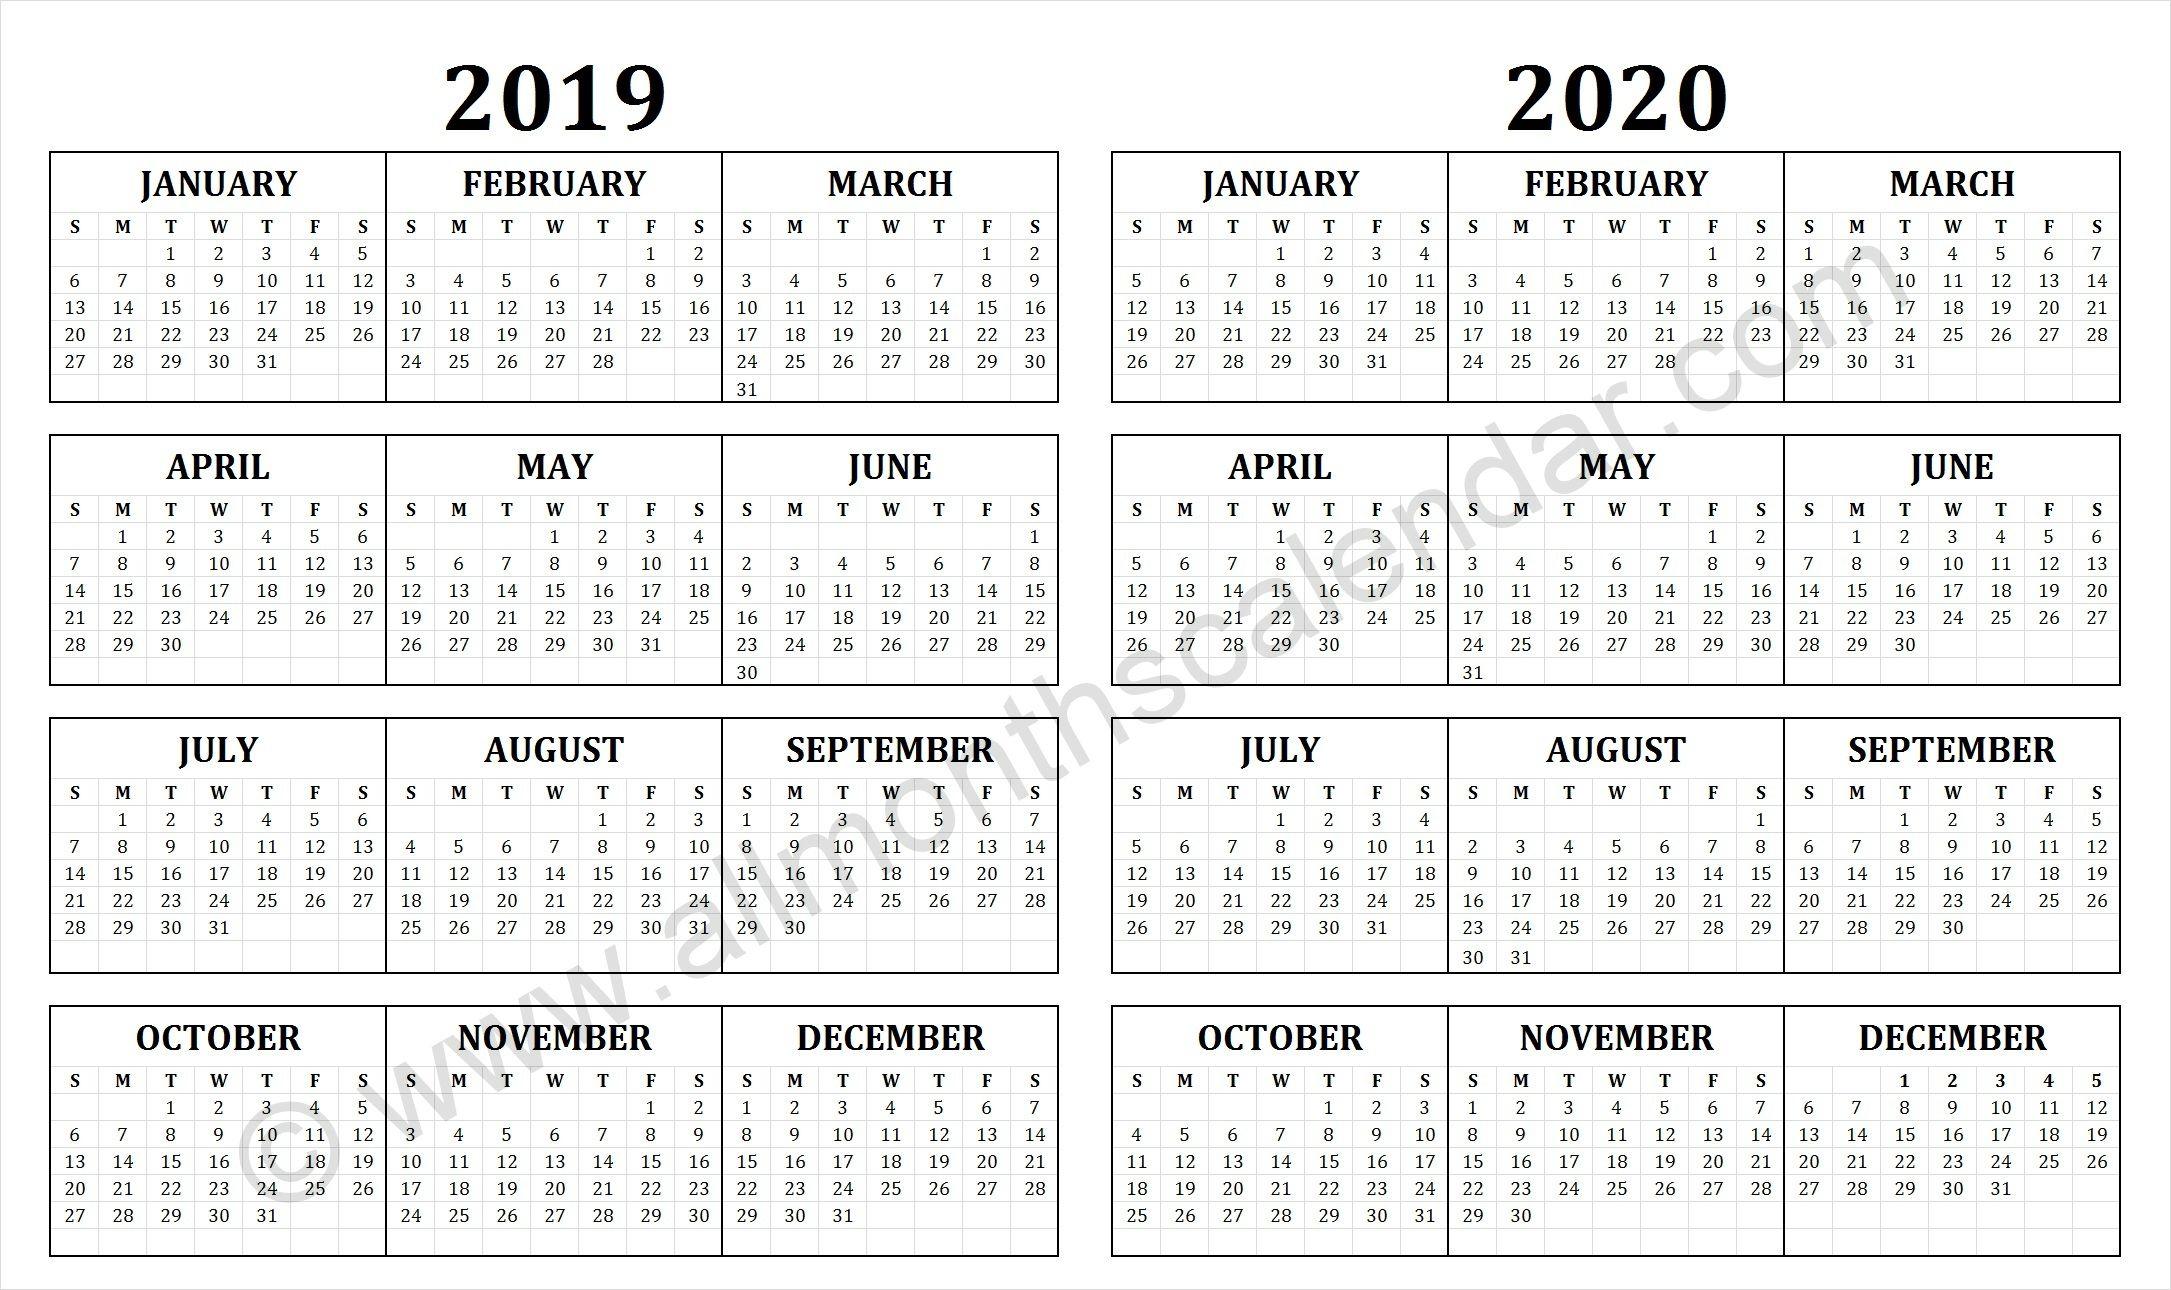 2019 And 2020 Calendar | Free Printable Calendar Templates in Julian Calendar 2020 - Quadax